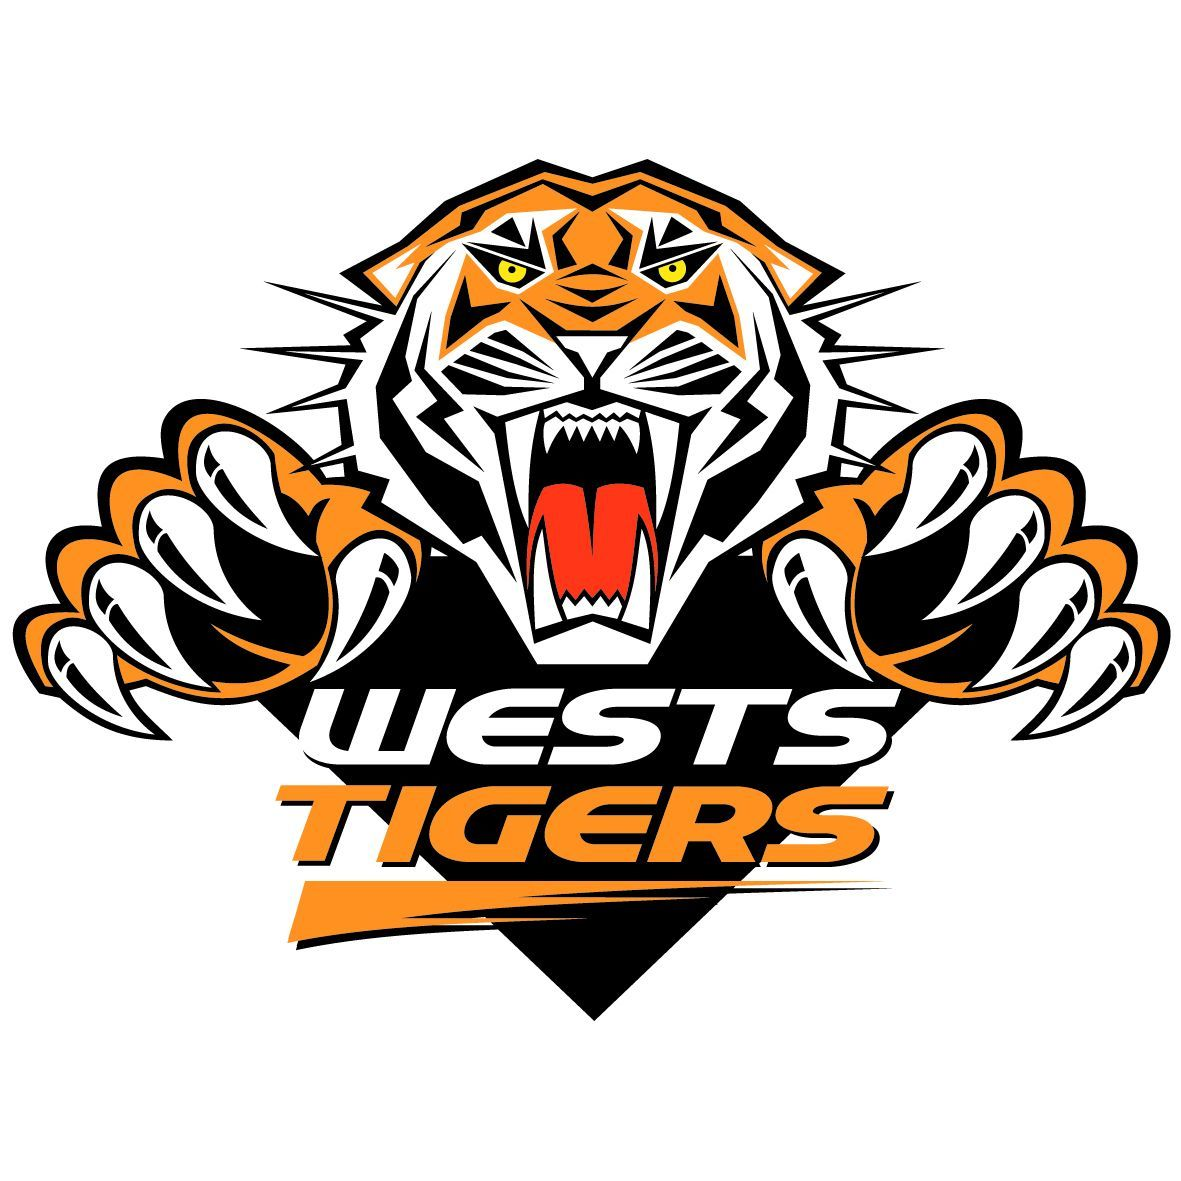 West tigers logo   Sports logos   Pinterest